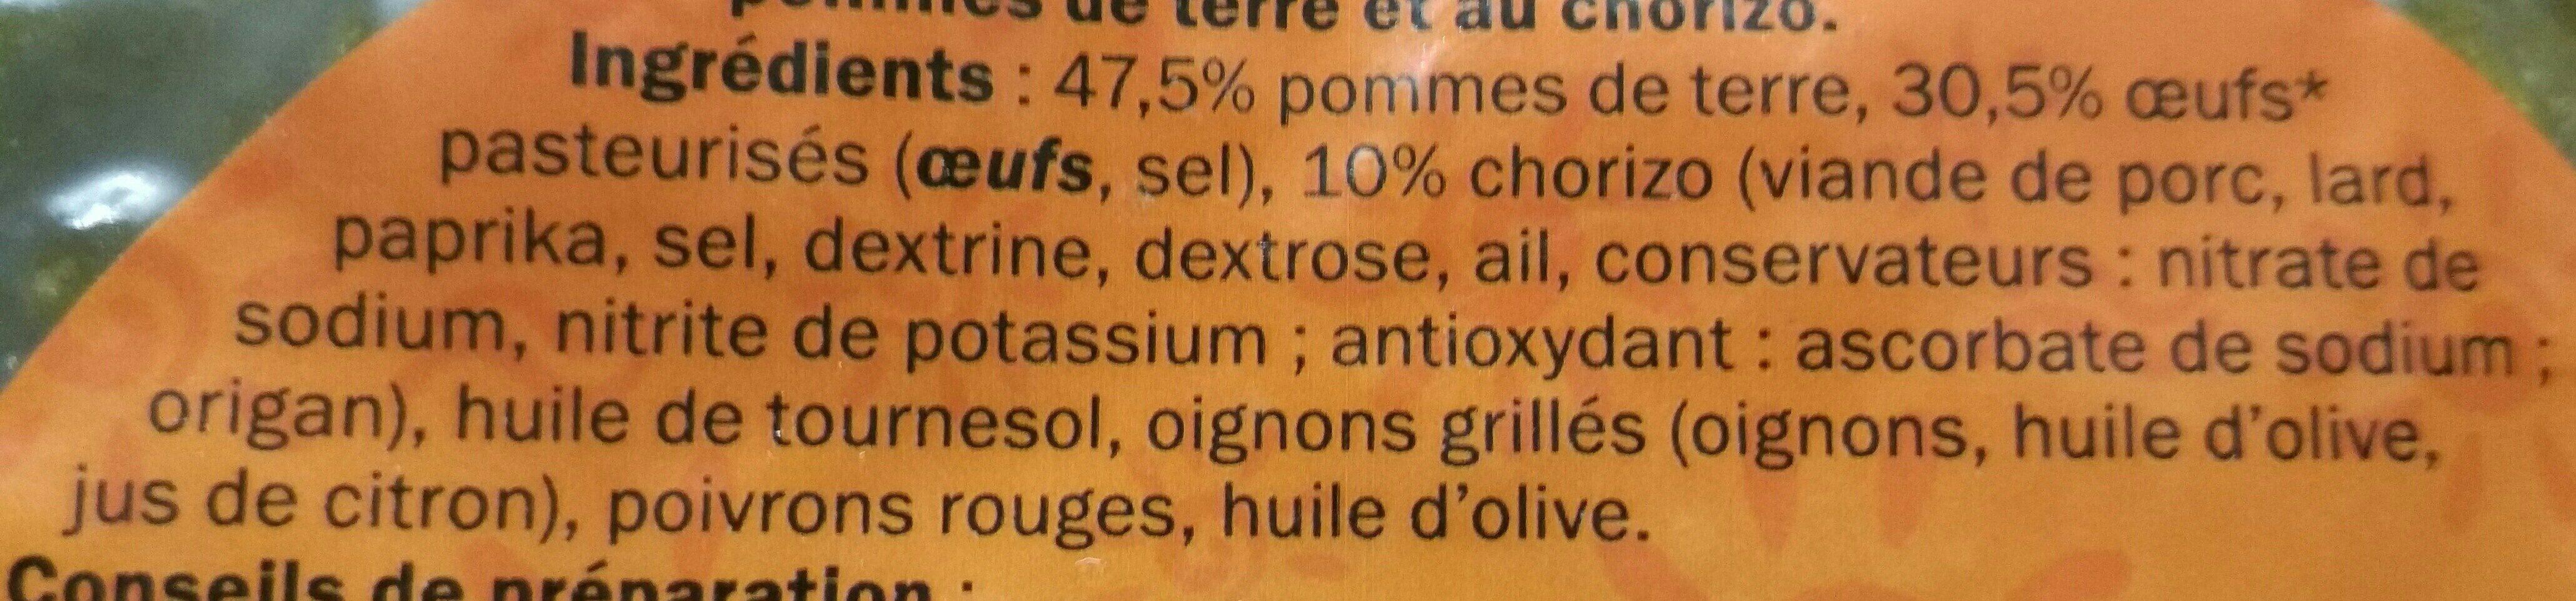 Tortilla au chorizo - Ingredients